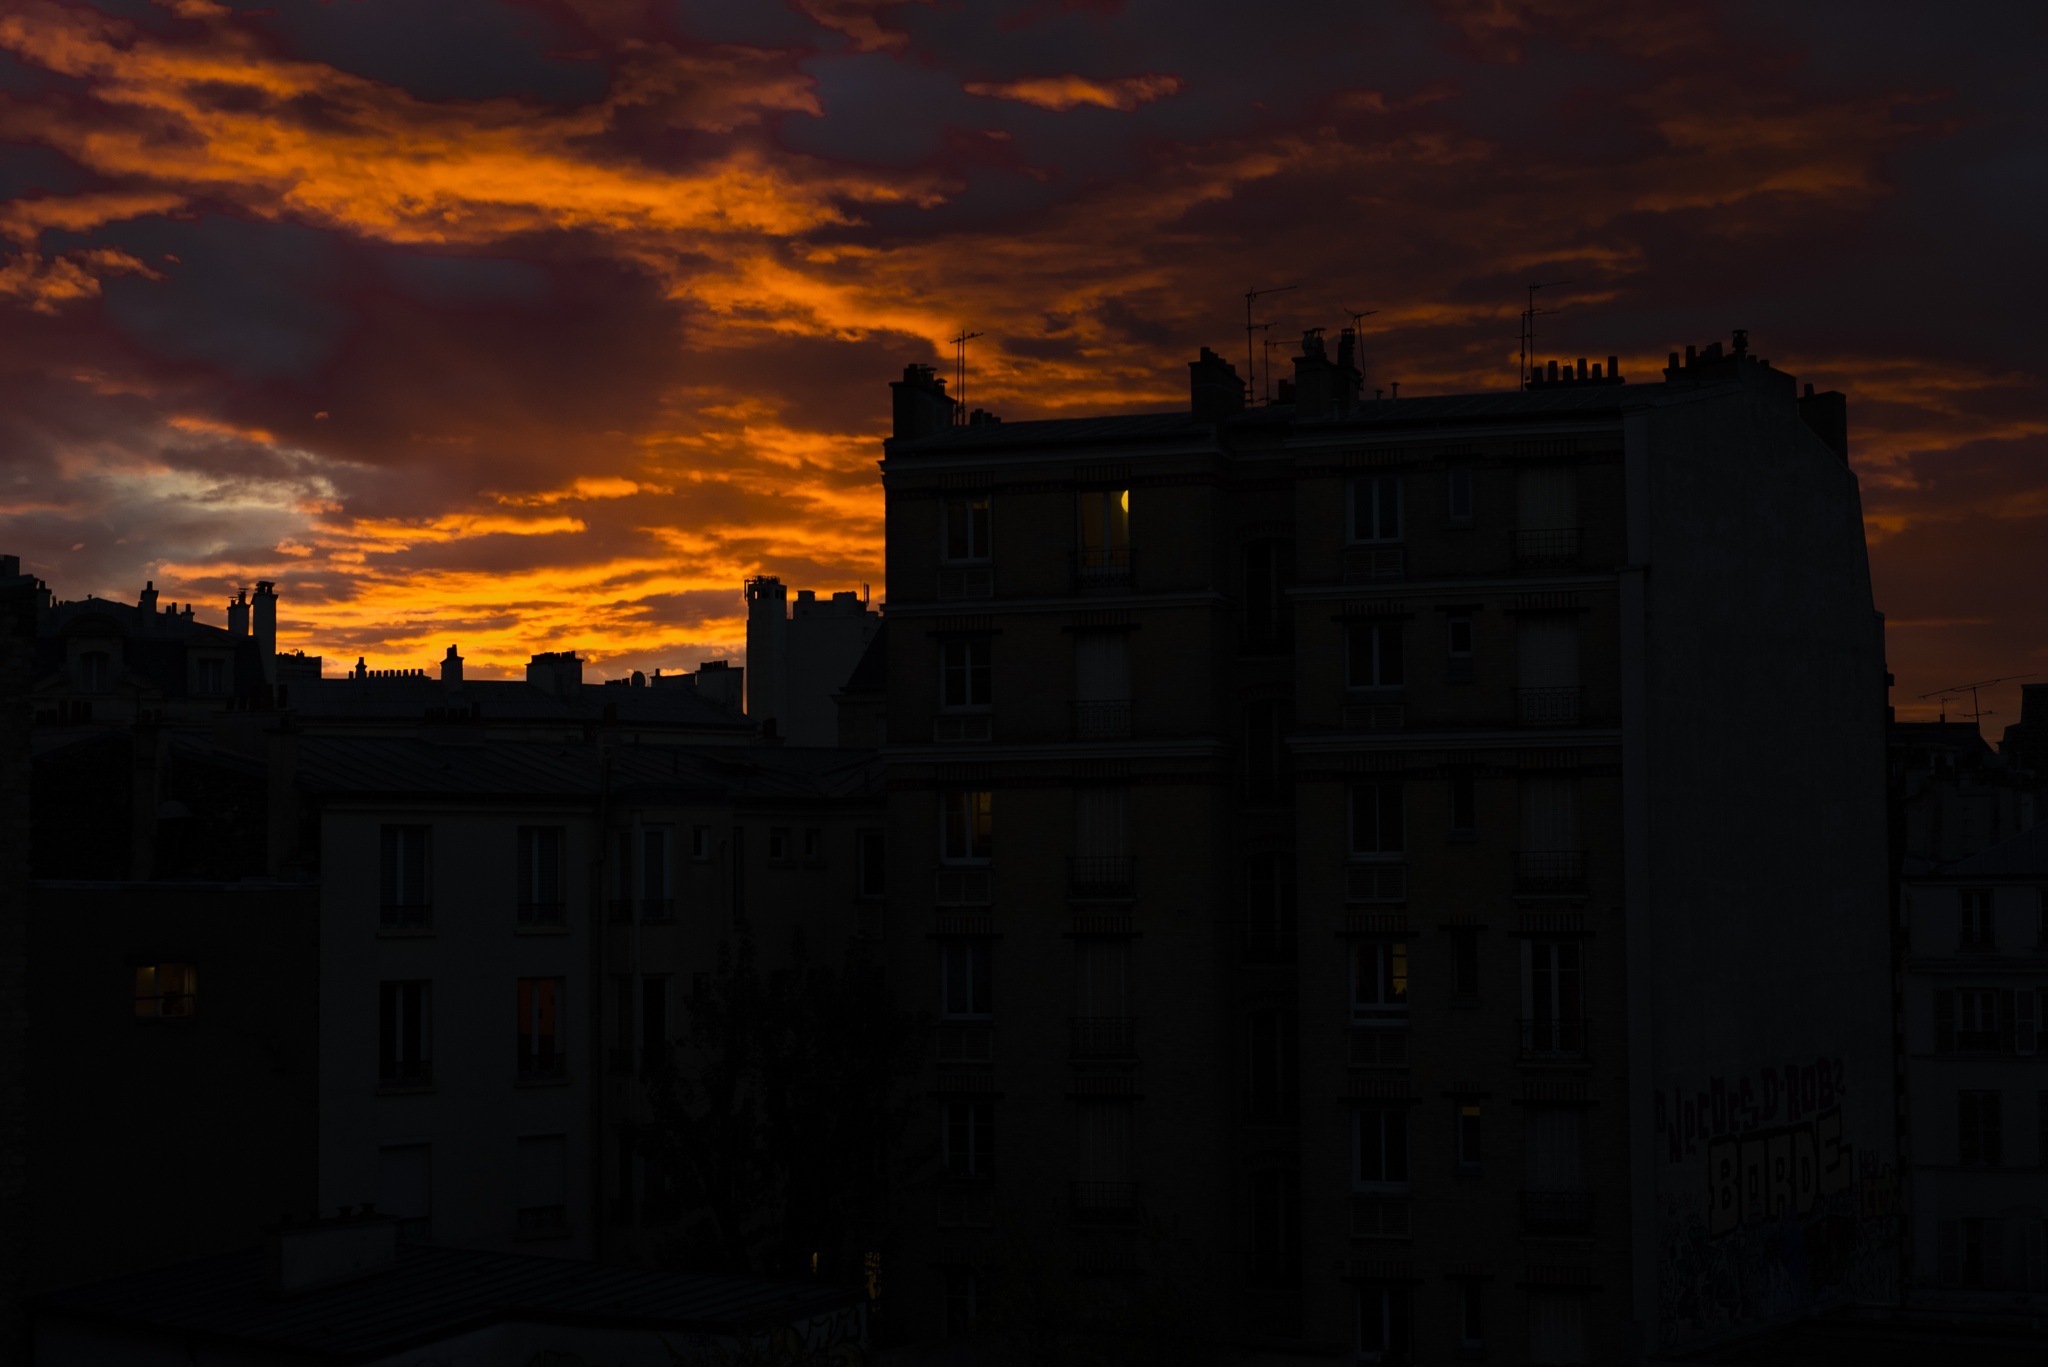 LIGNE D'HORIZON / UNDER A BLOOD RED SKY by Lëon